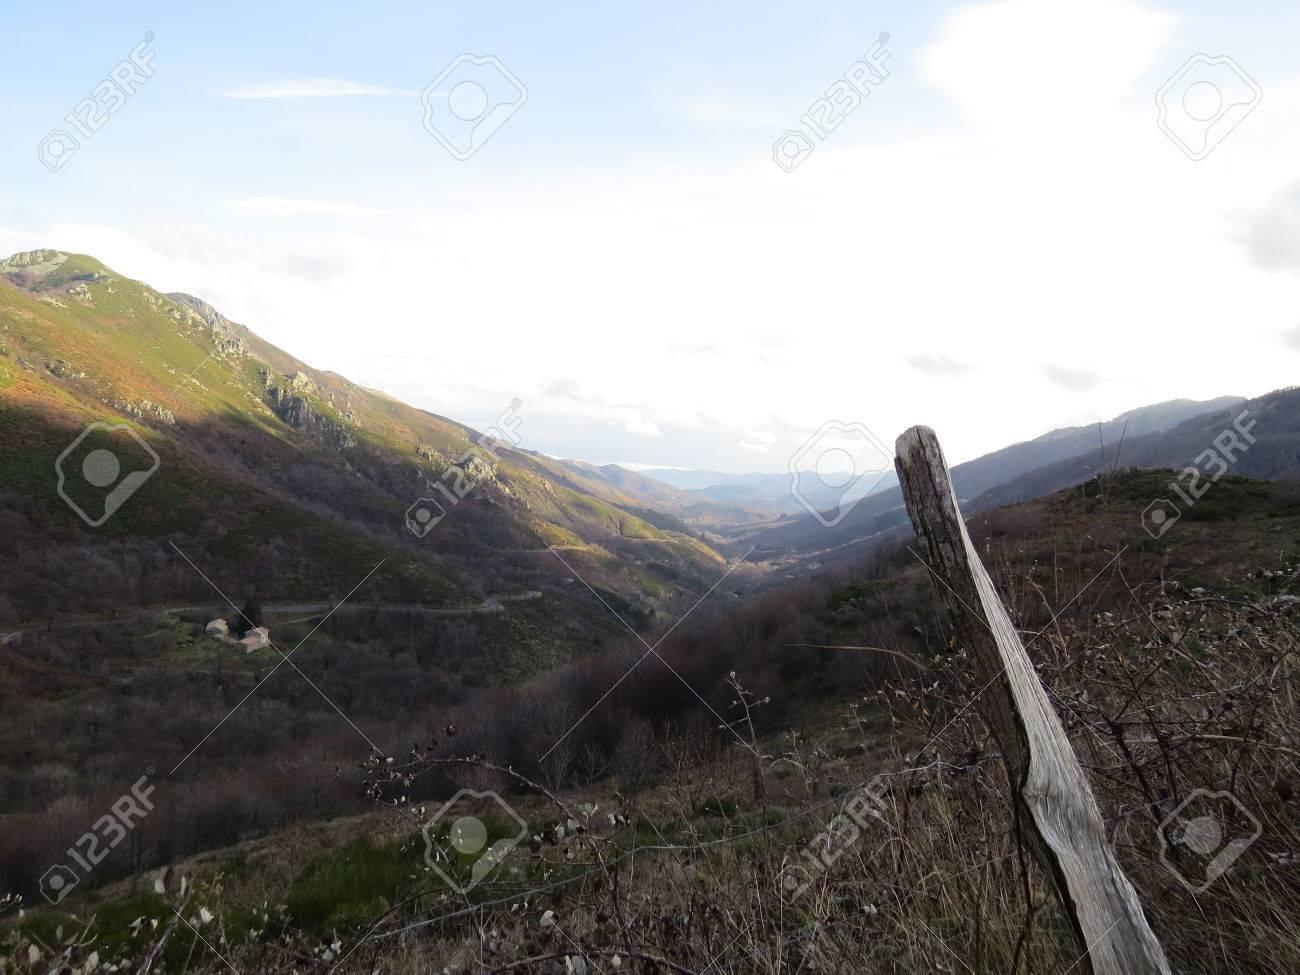 Panorama montagne ardechoise - 43390621